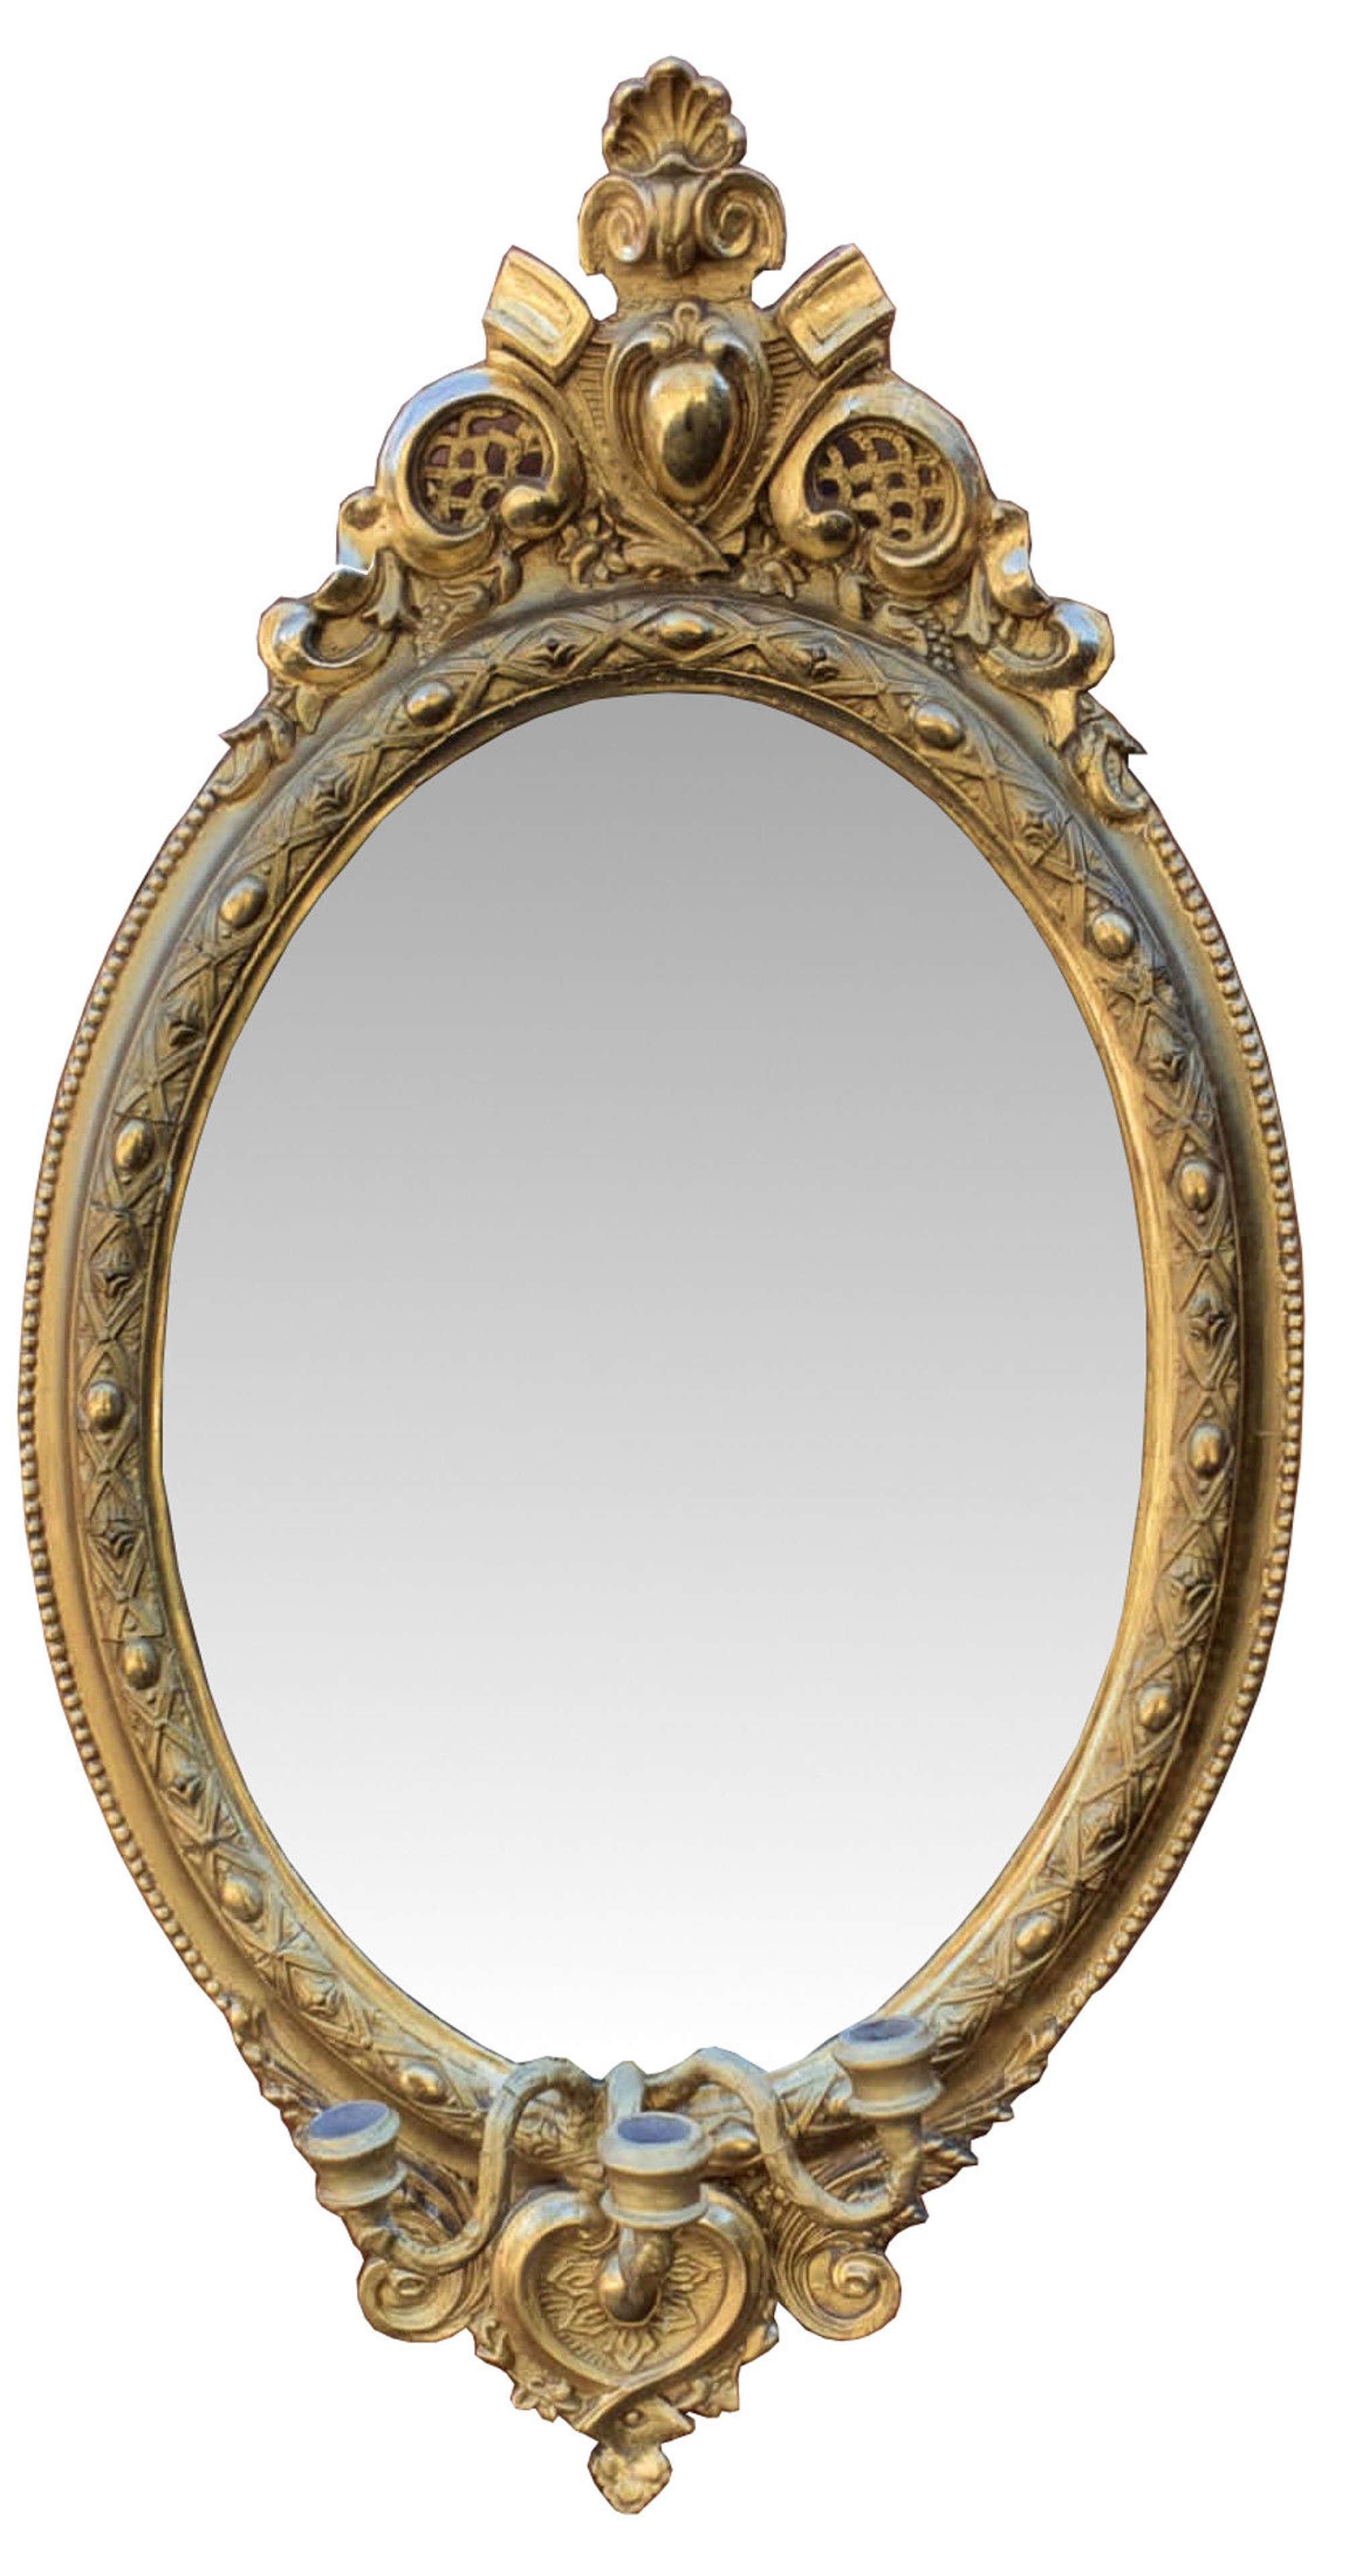 19th Century Gilt Girondole Mirror